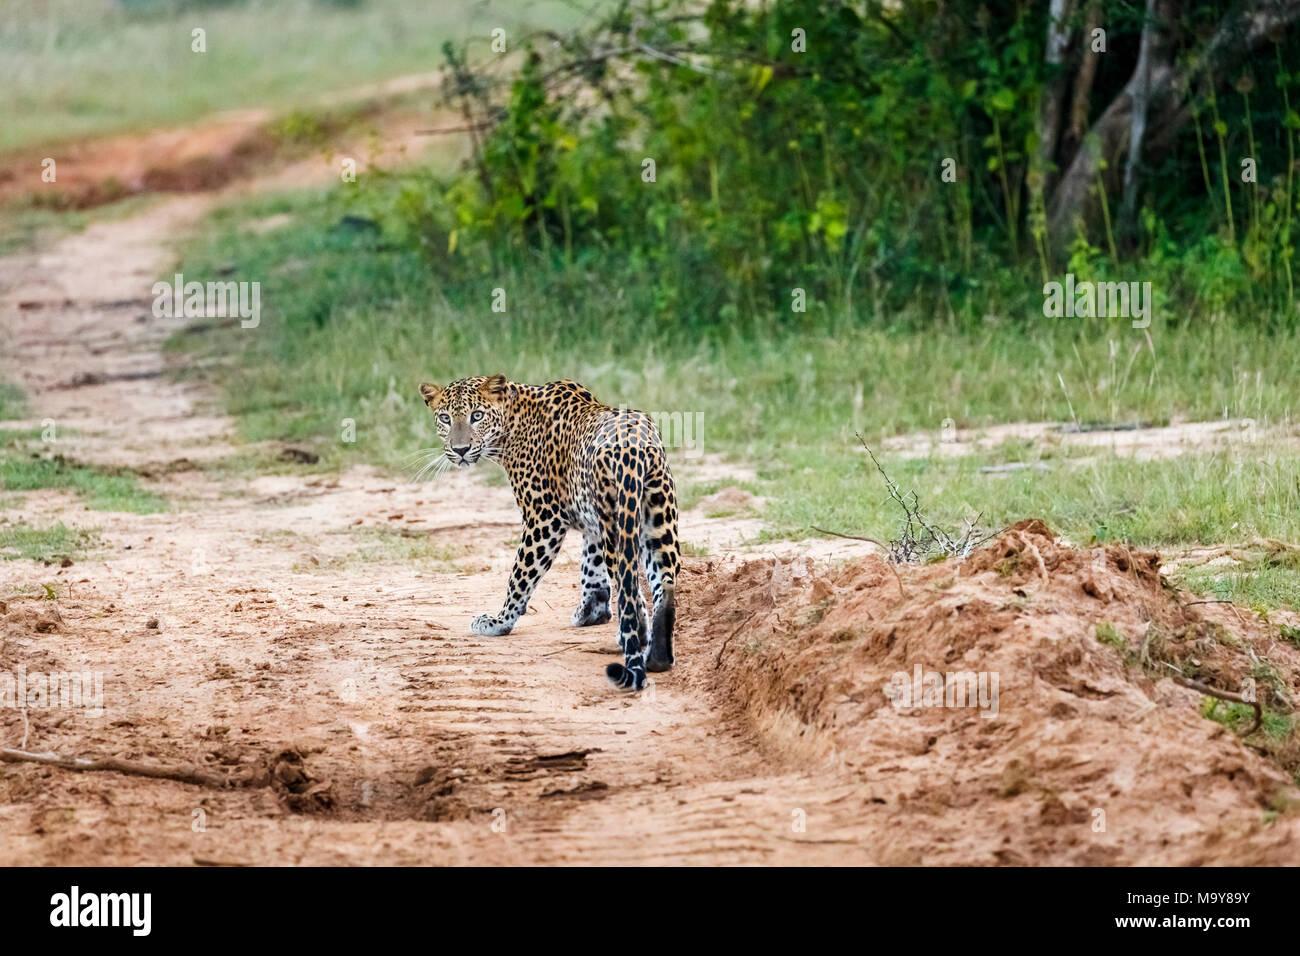 Female leopard (Panthera pardus) standing on a track looking back, Kumana National Park, Eastern Province, Sri Lanka - Stock Image